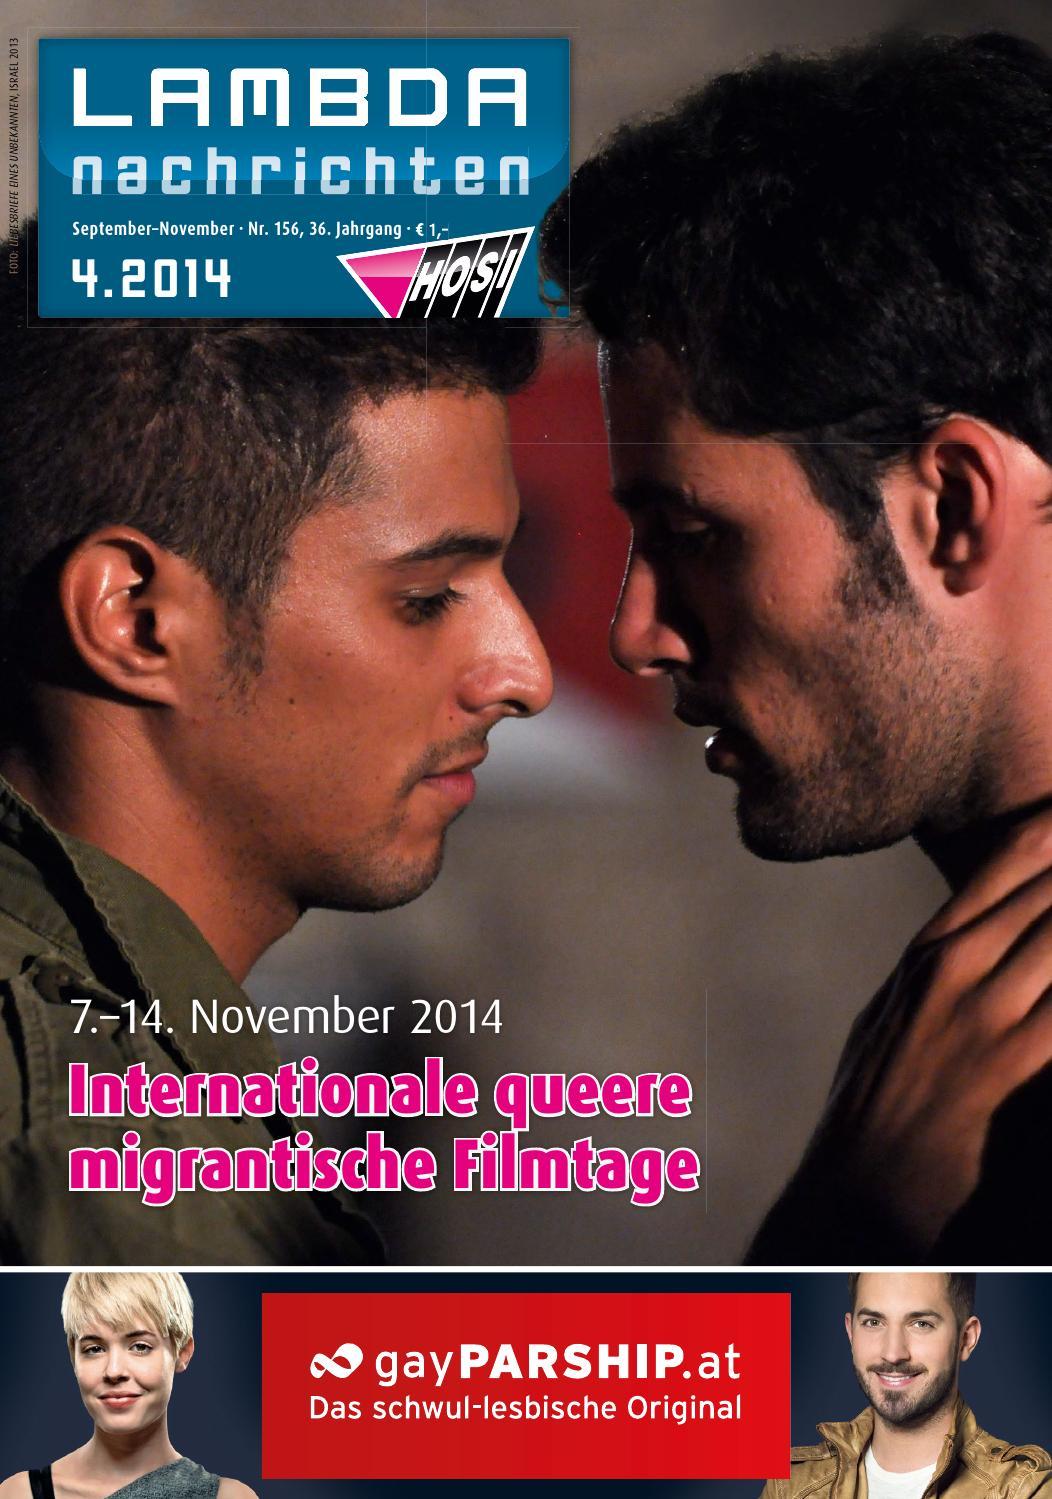 Gay dating in kirchbichl: Growilfersdorf singles kostenlos